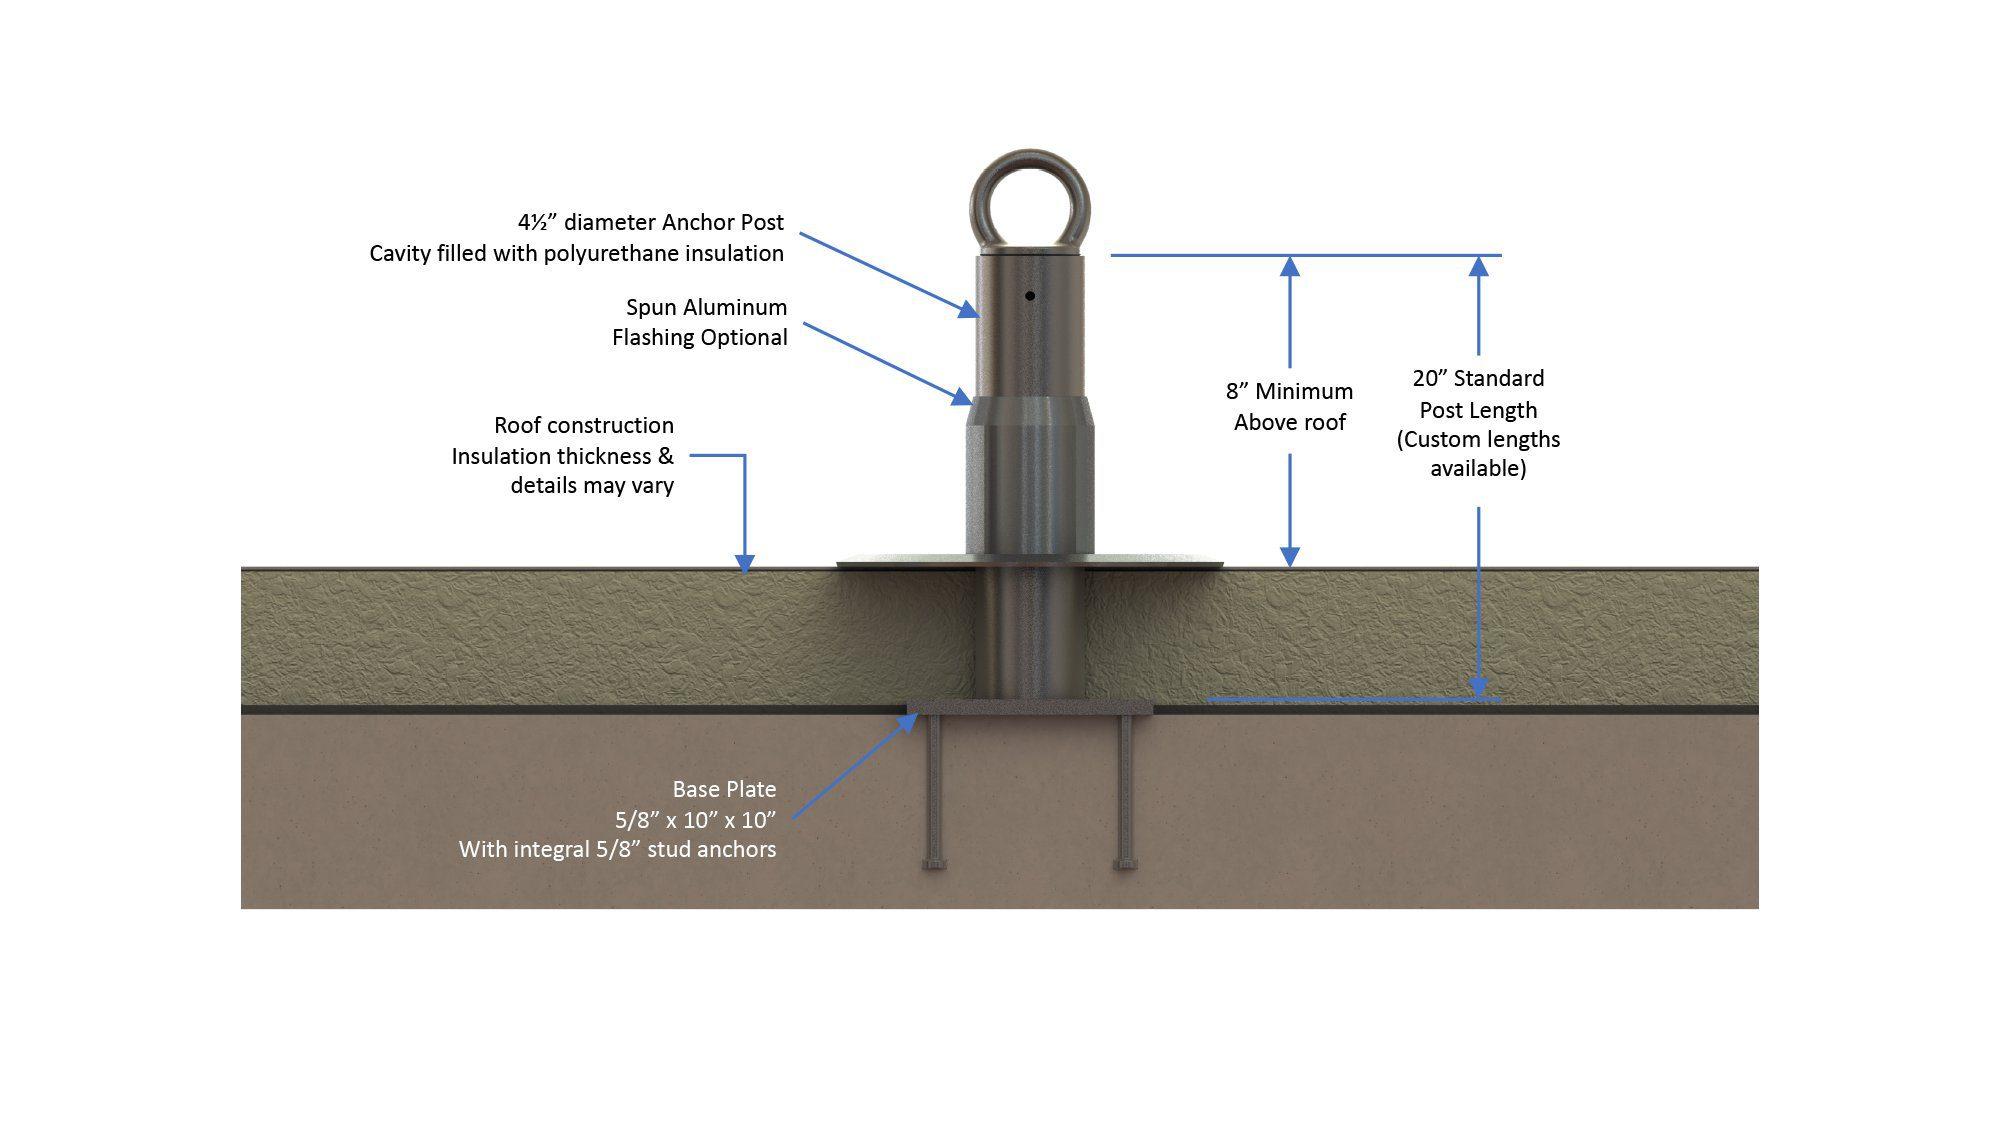 Embedded Tieback Anchor